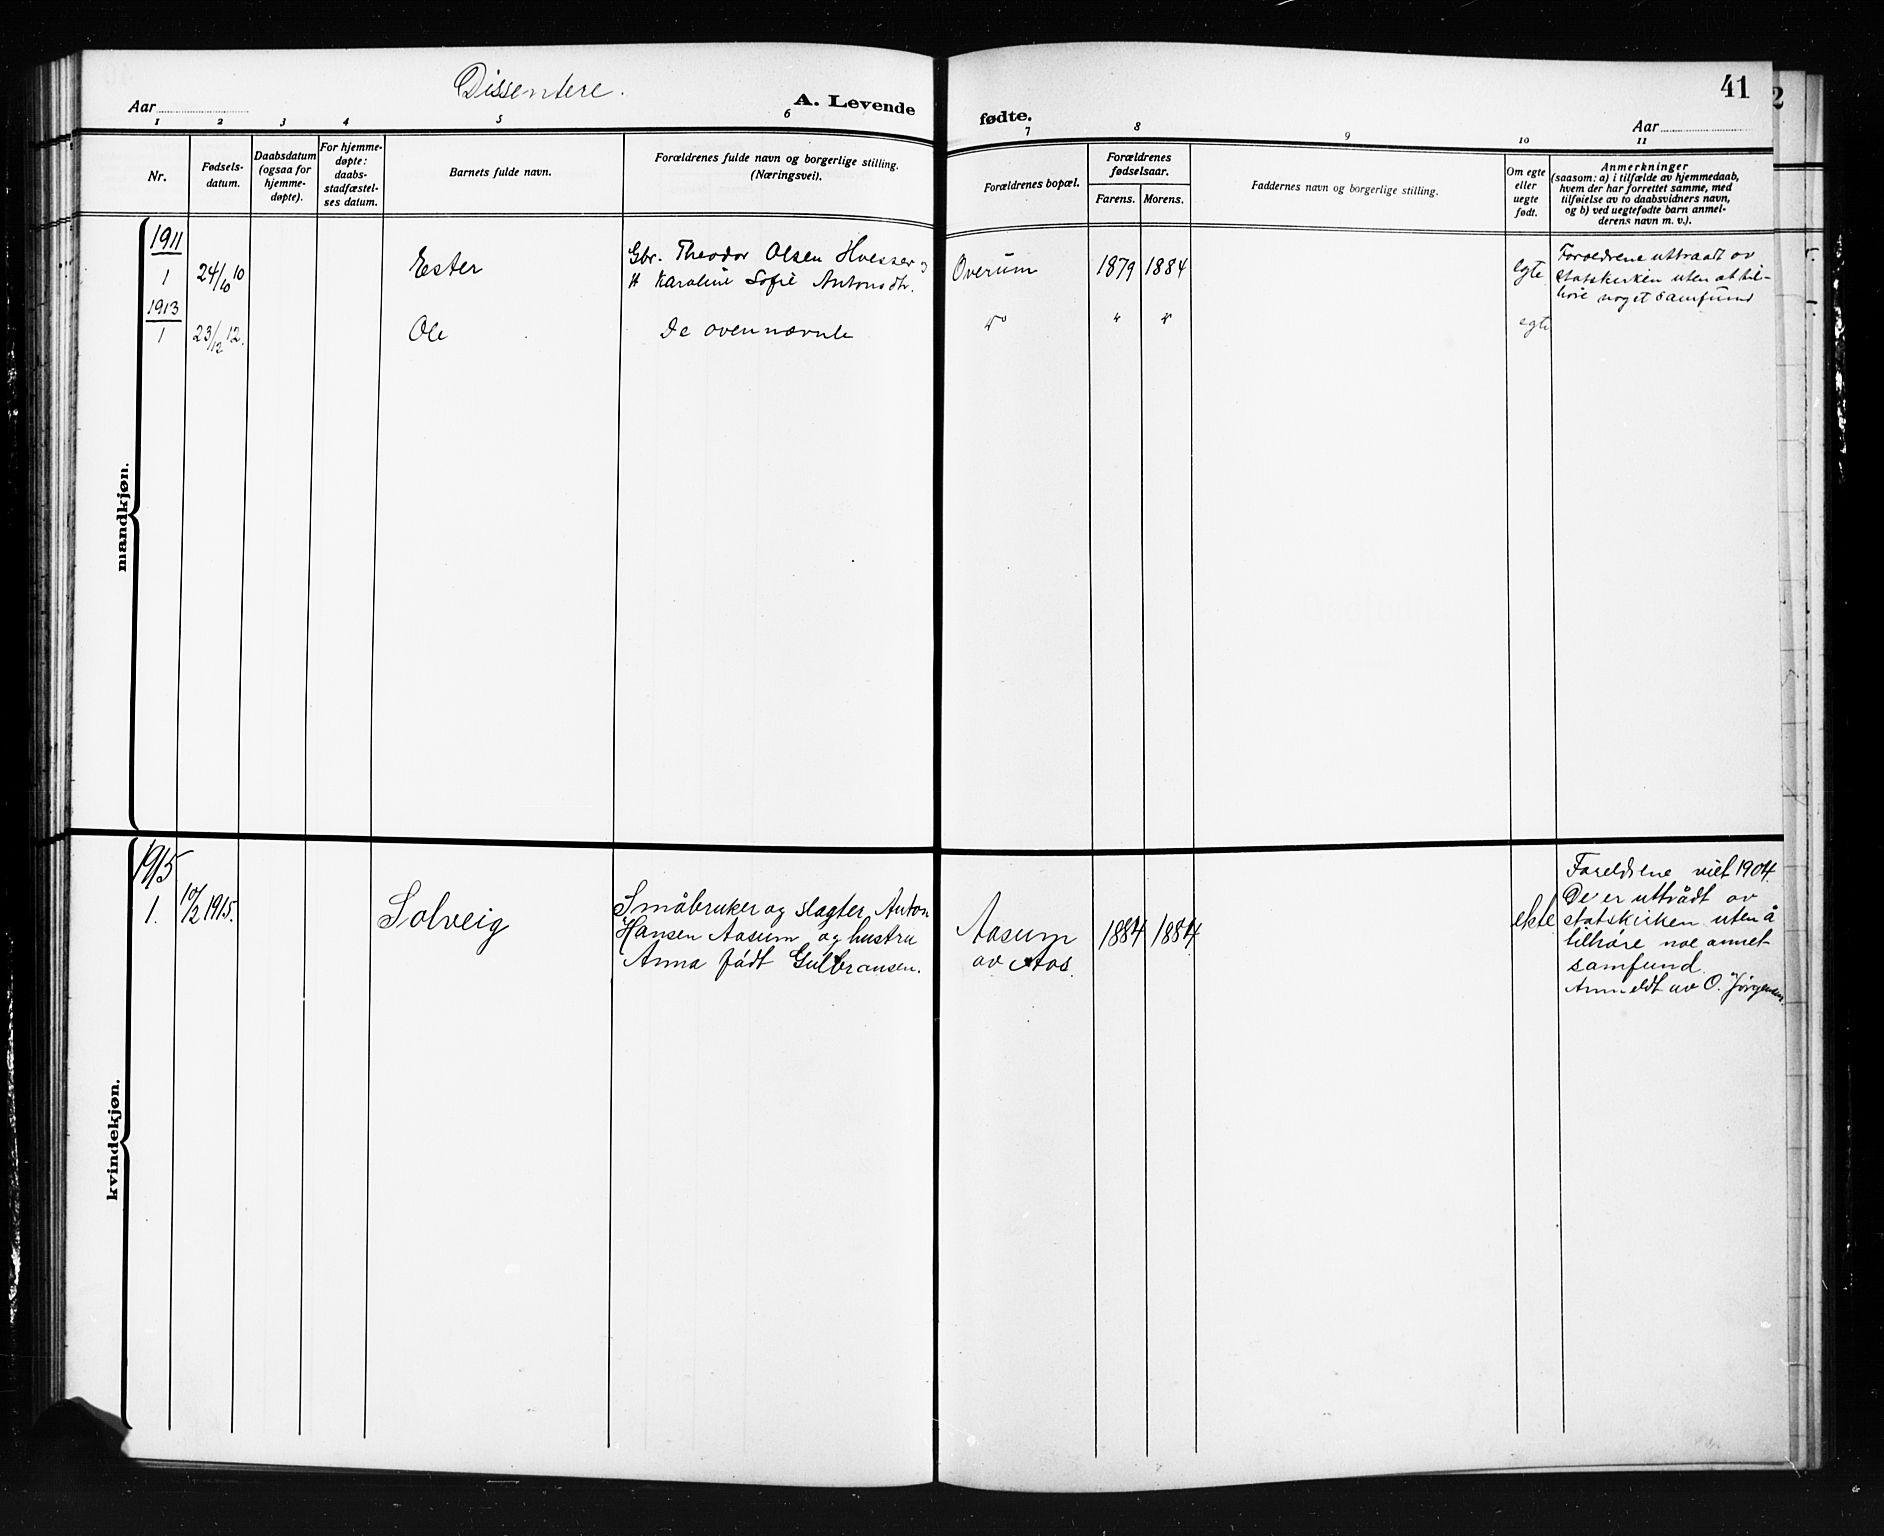 SAO, Trøgstad prestekontor Kirkebøker, G/Gb/L0001: Klokkerbok nr. II 1, 1911-1925, s. 41